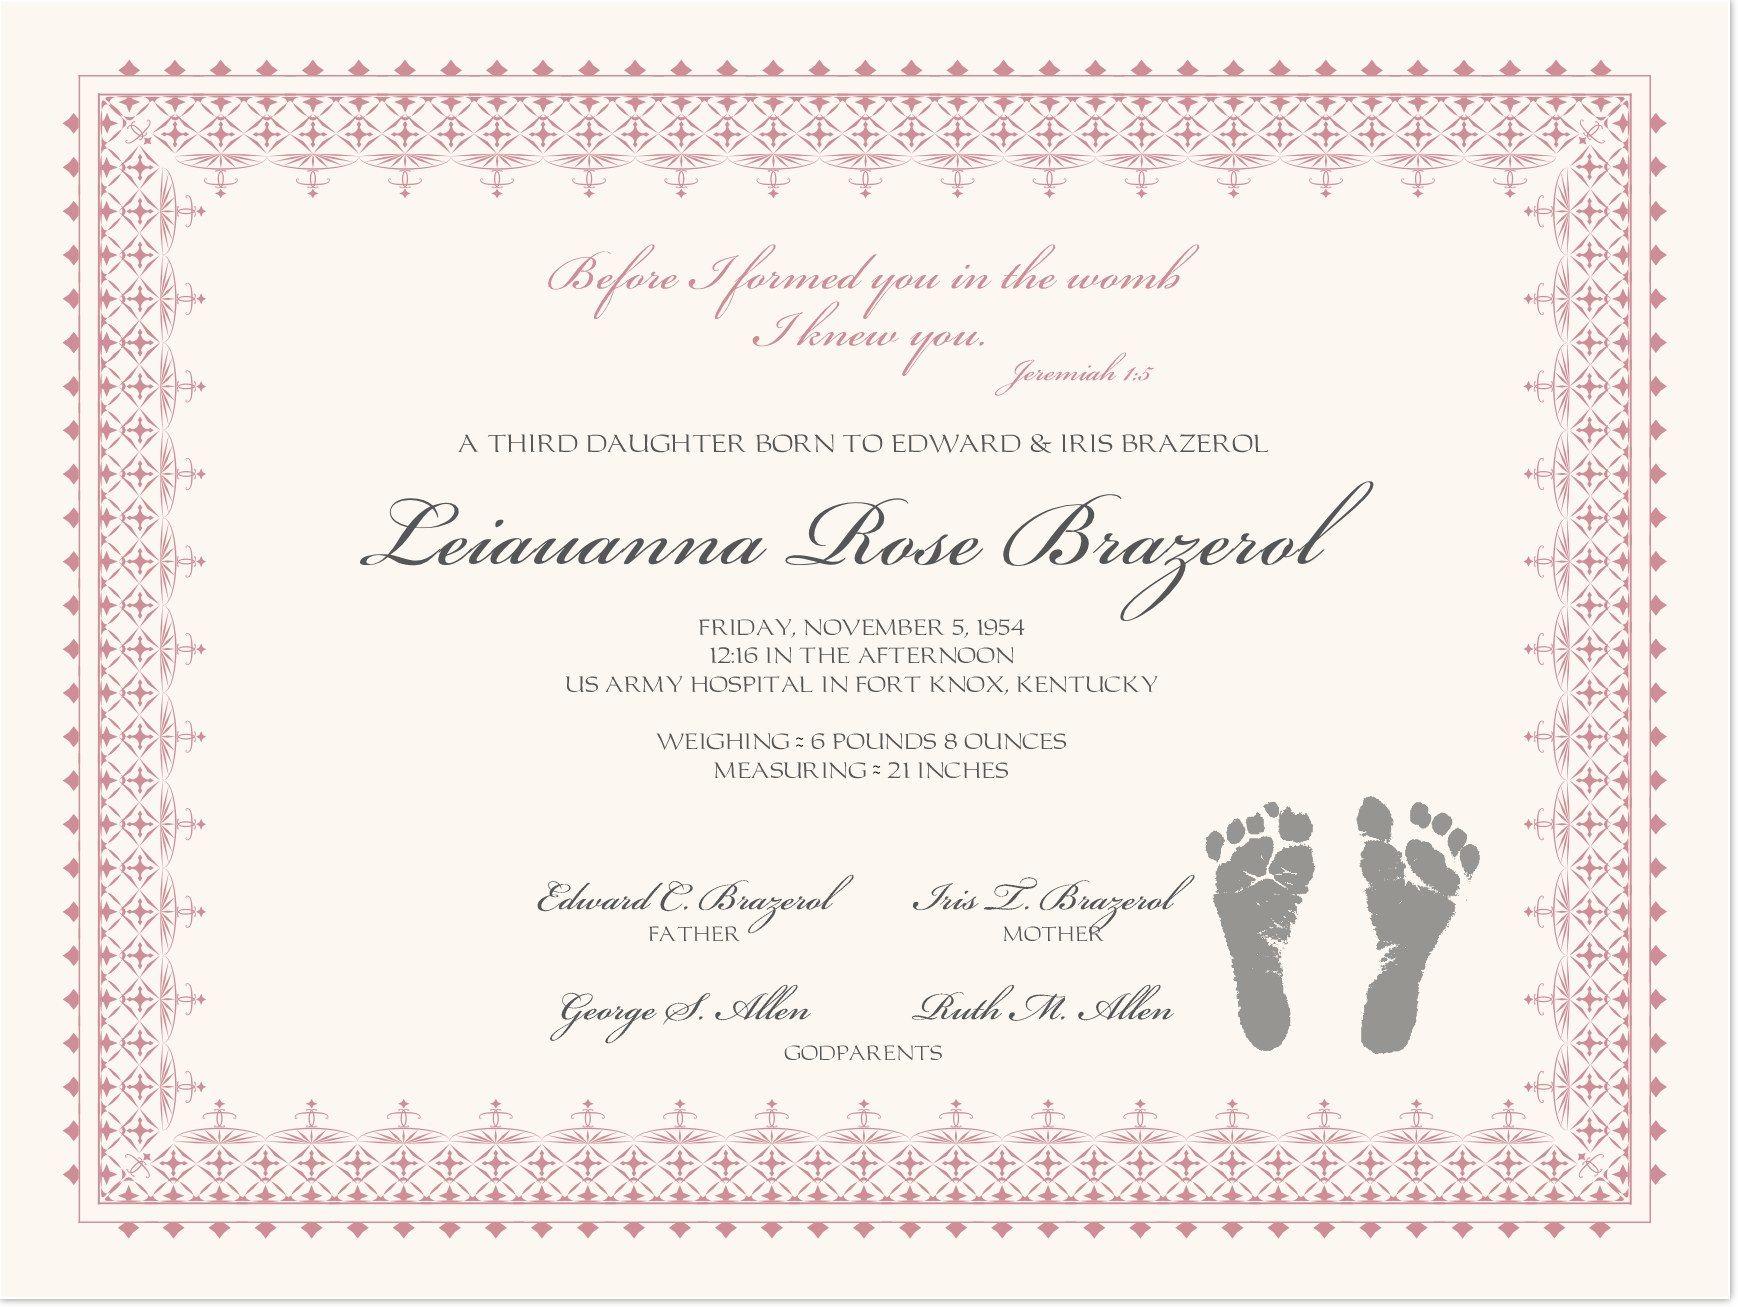 Footprints Baby Certificates | Birth Certificate Template Regarding Baby Dedication Certificate Template